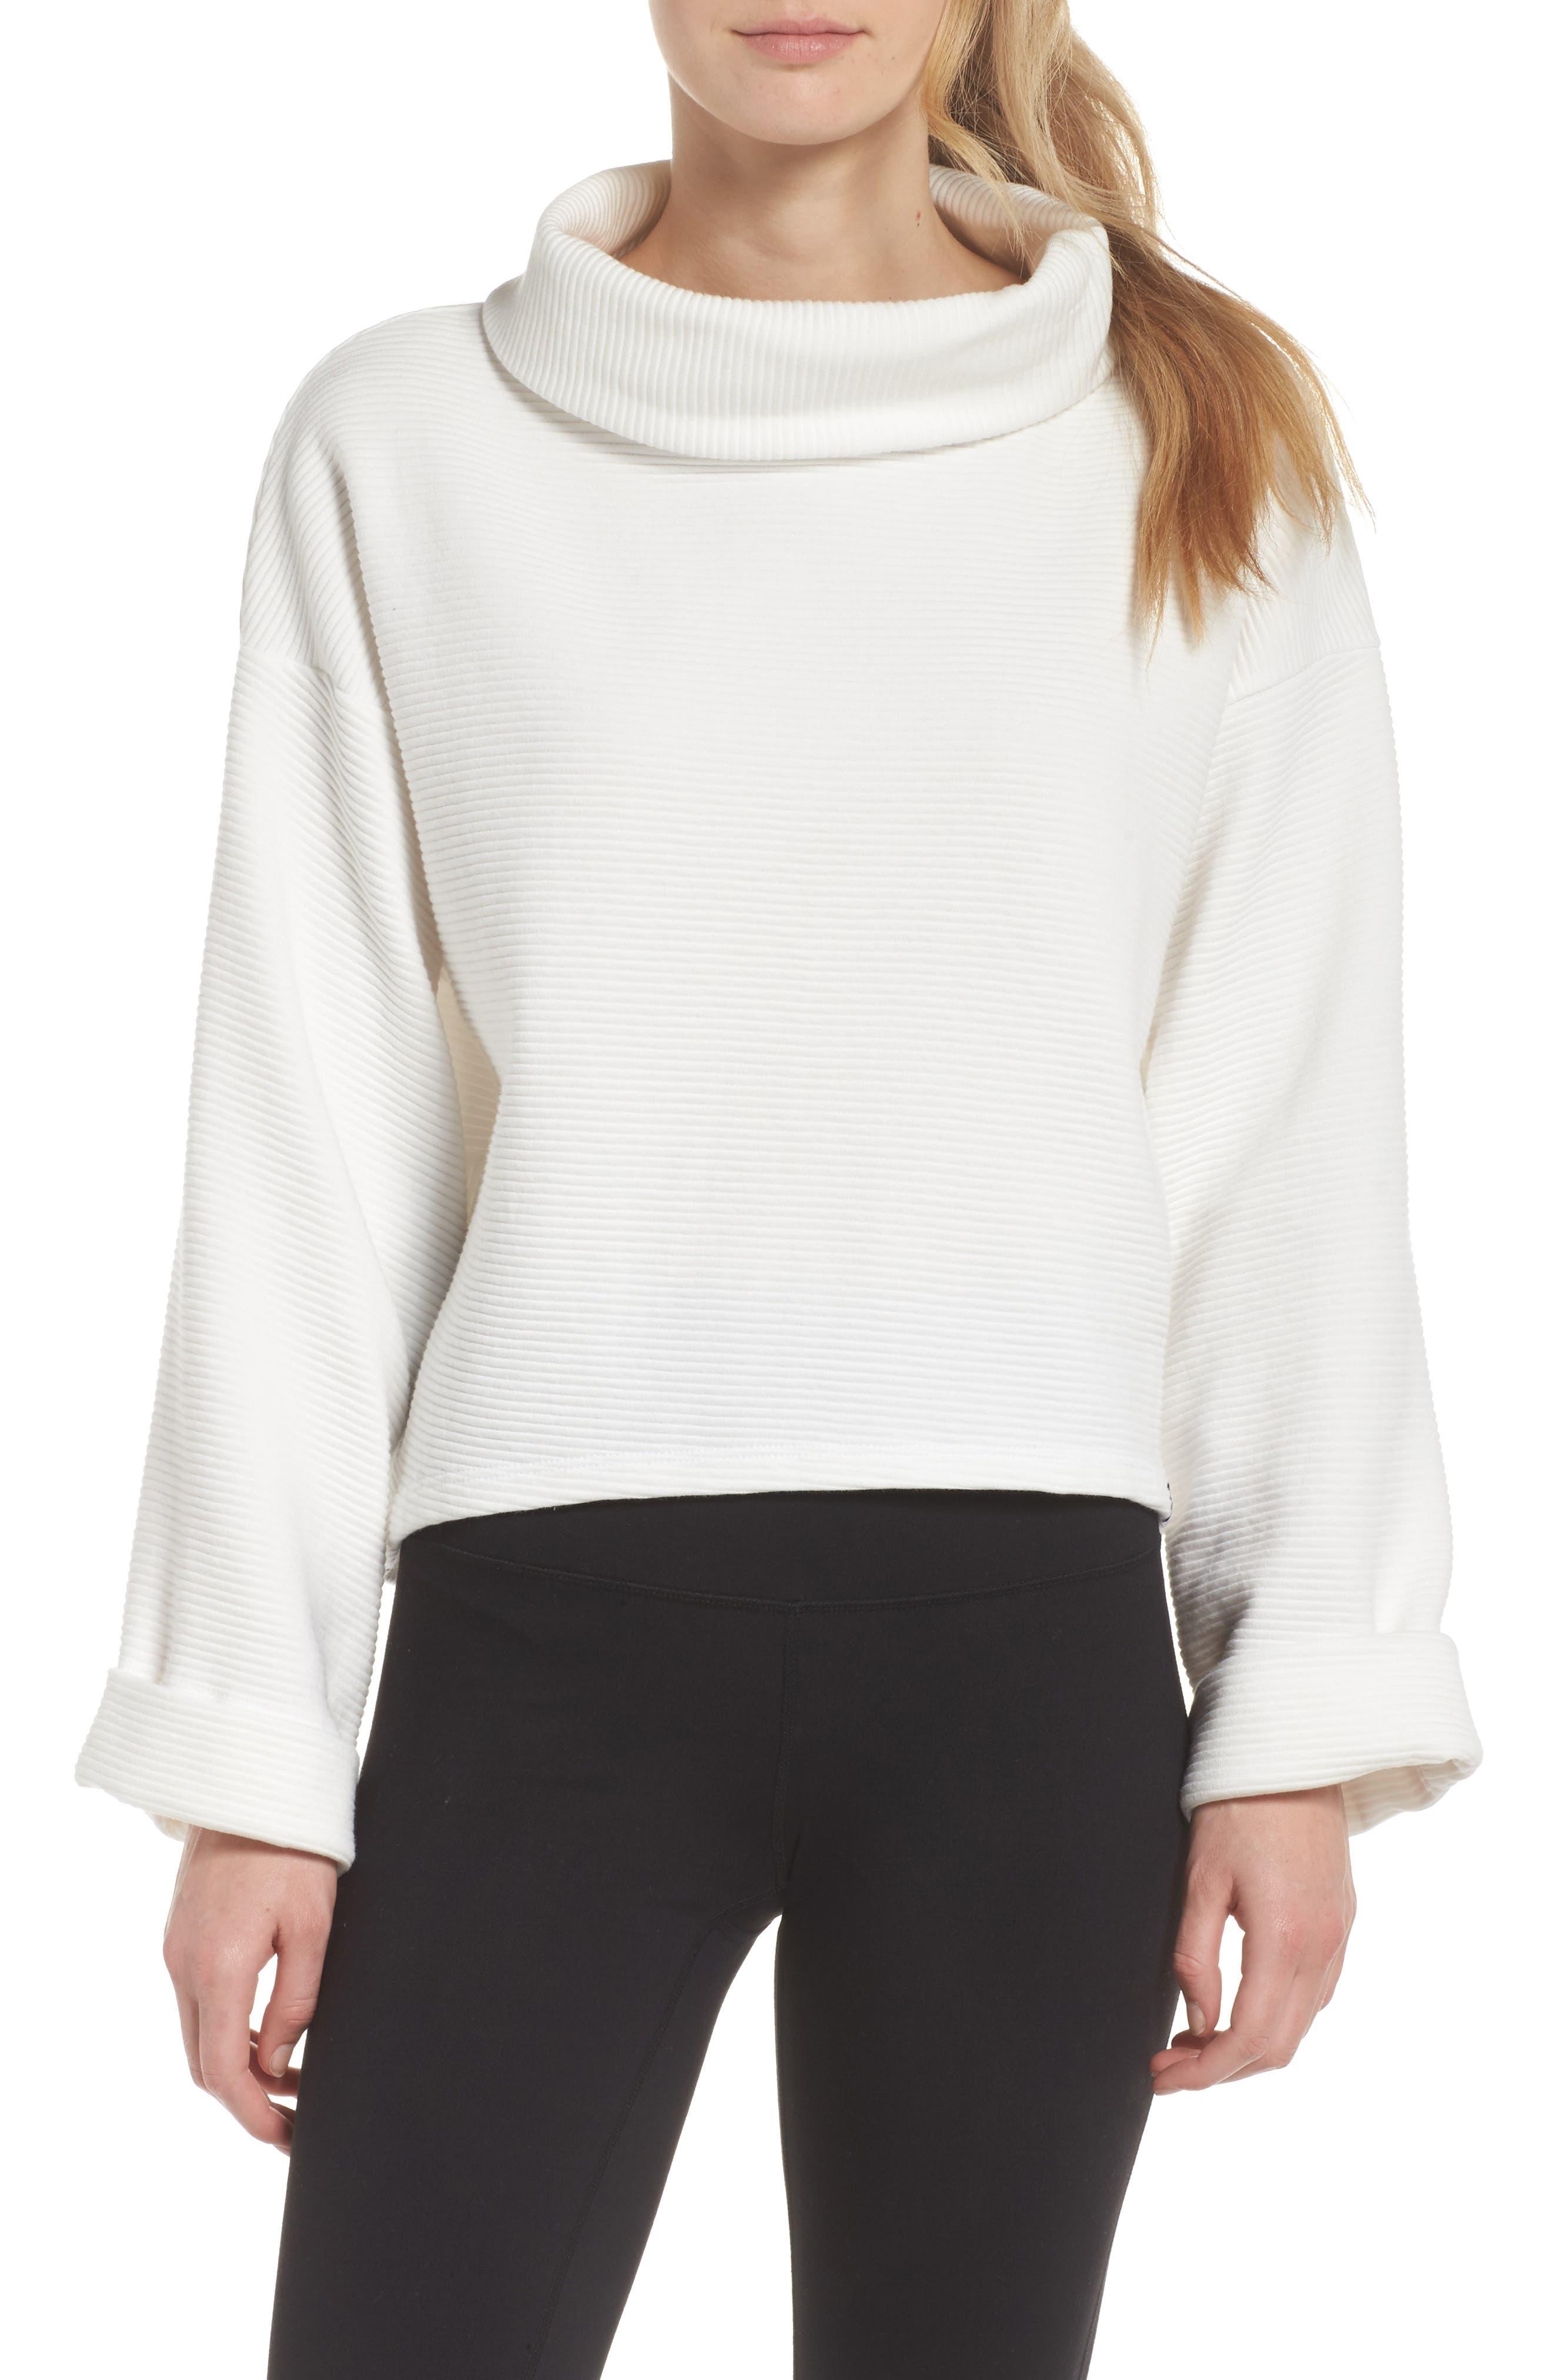 Whittier Sweatshirt,                         Main,                         color, 100